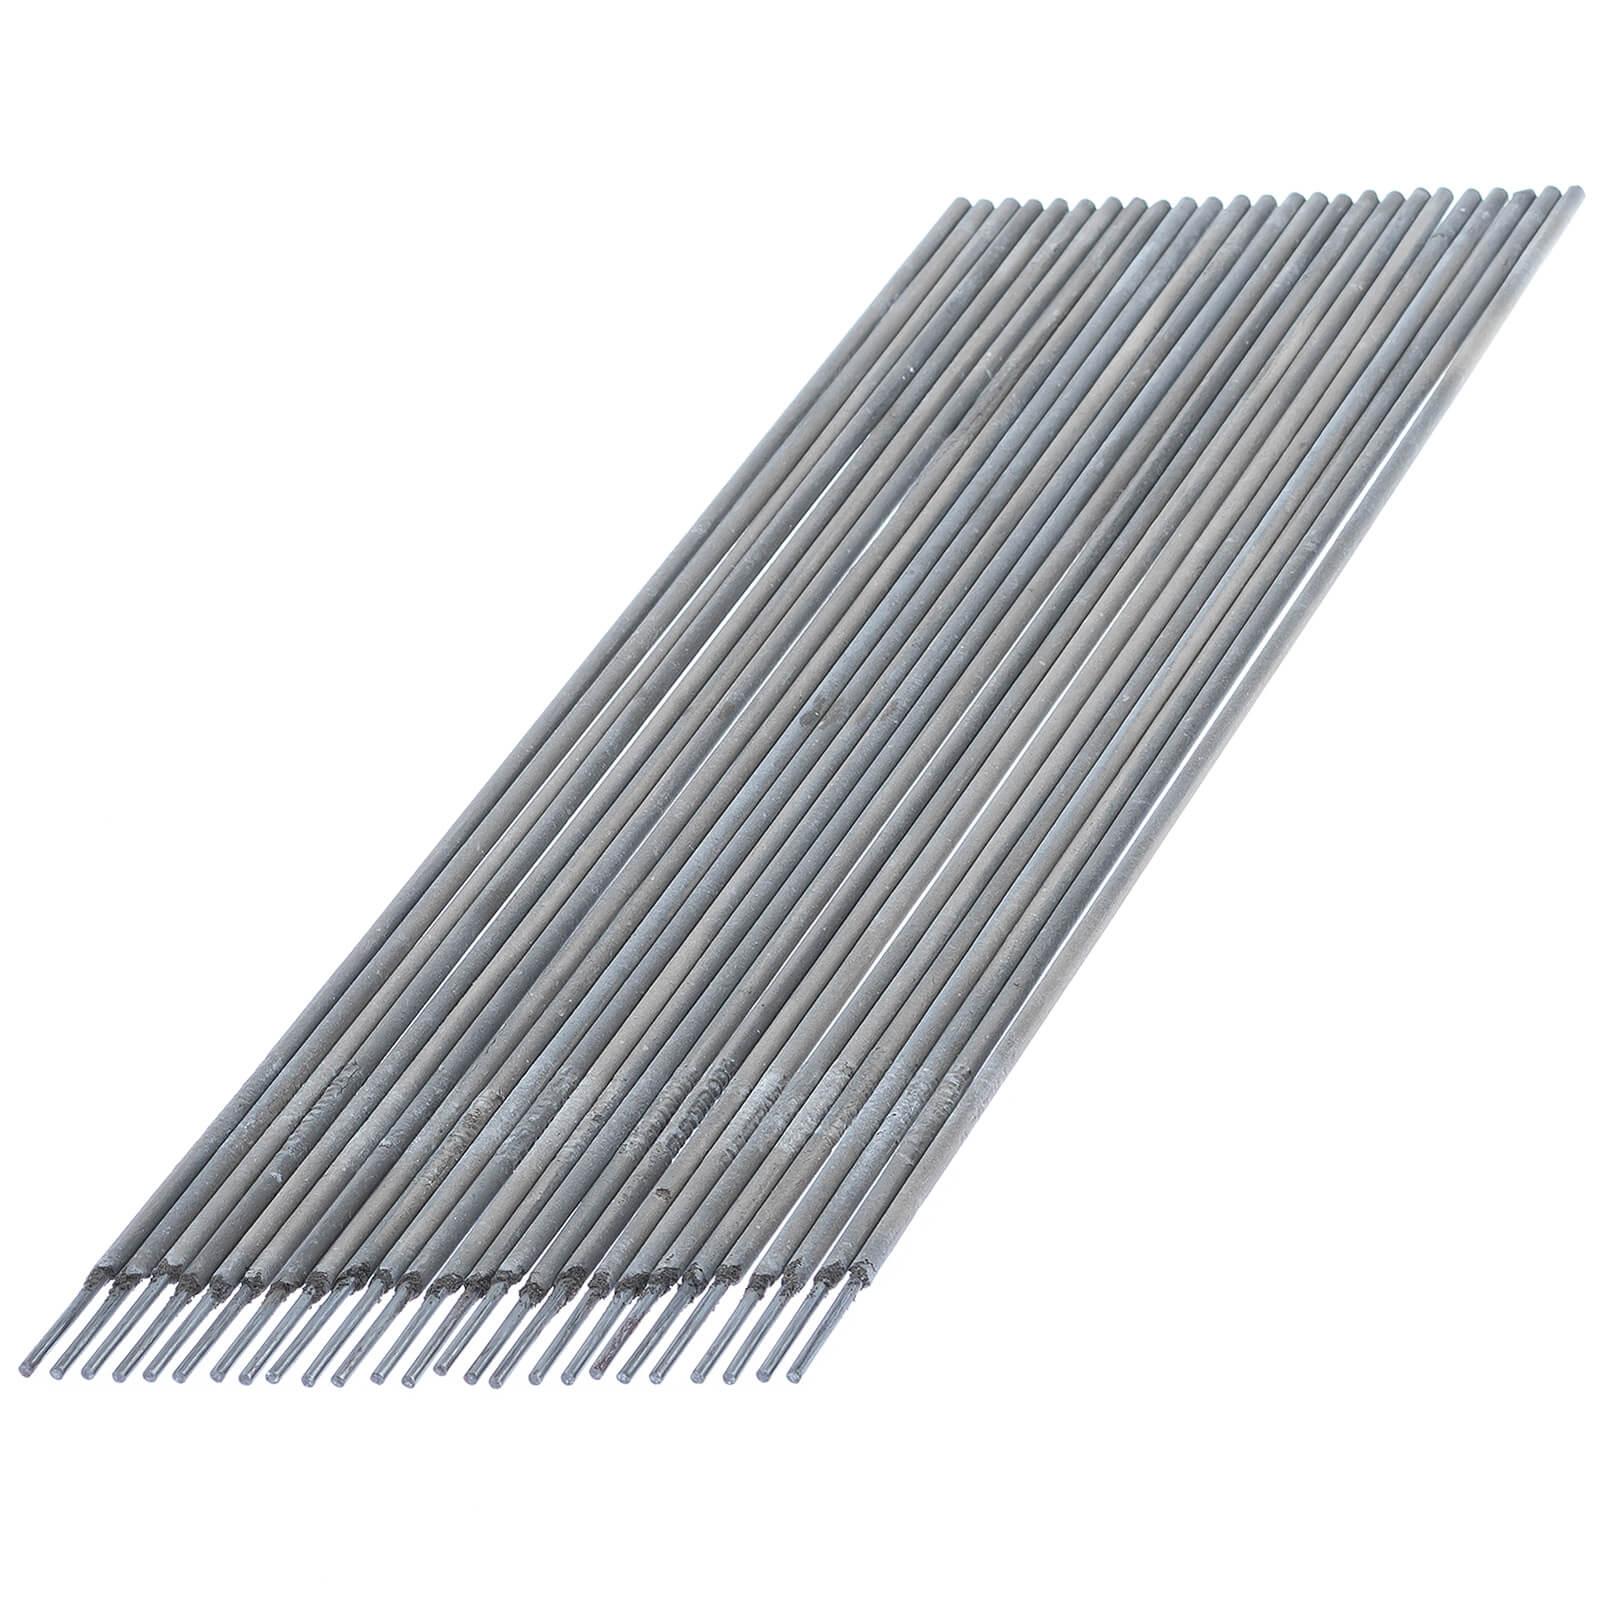 schwei elektroden 2 mm metallteile verbinden. Black Bedroom Furniture Sets. Home Design Ideas